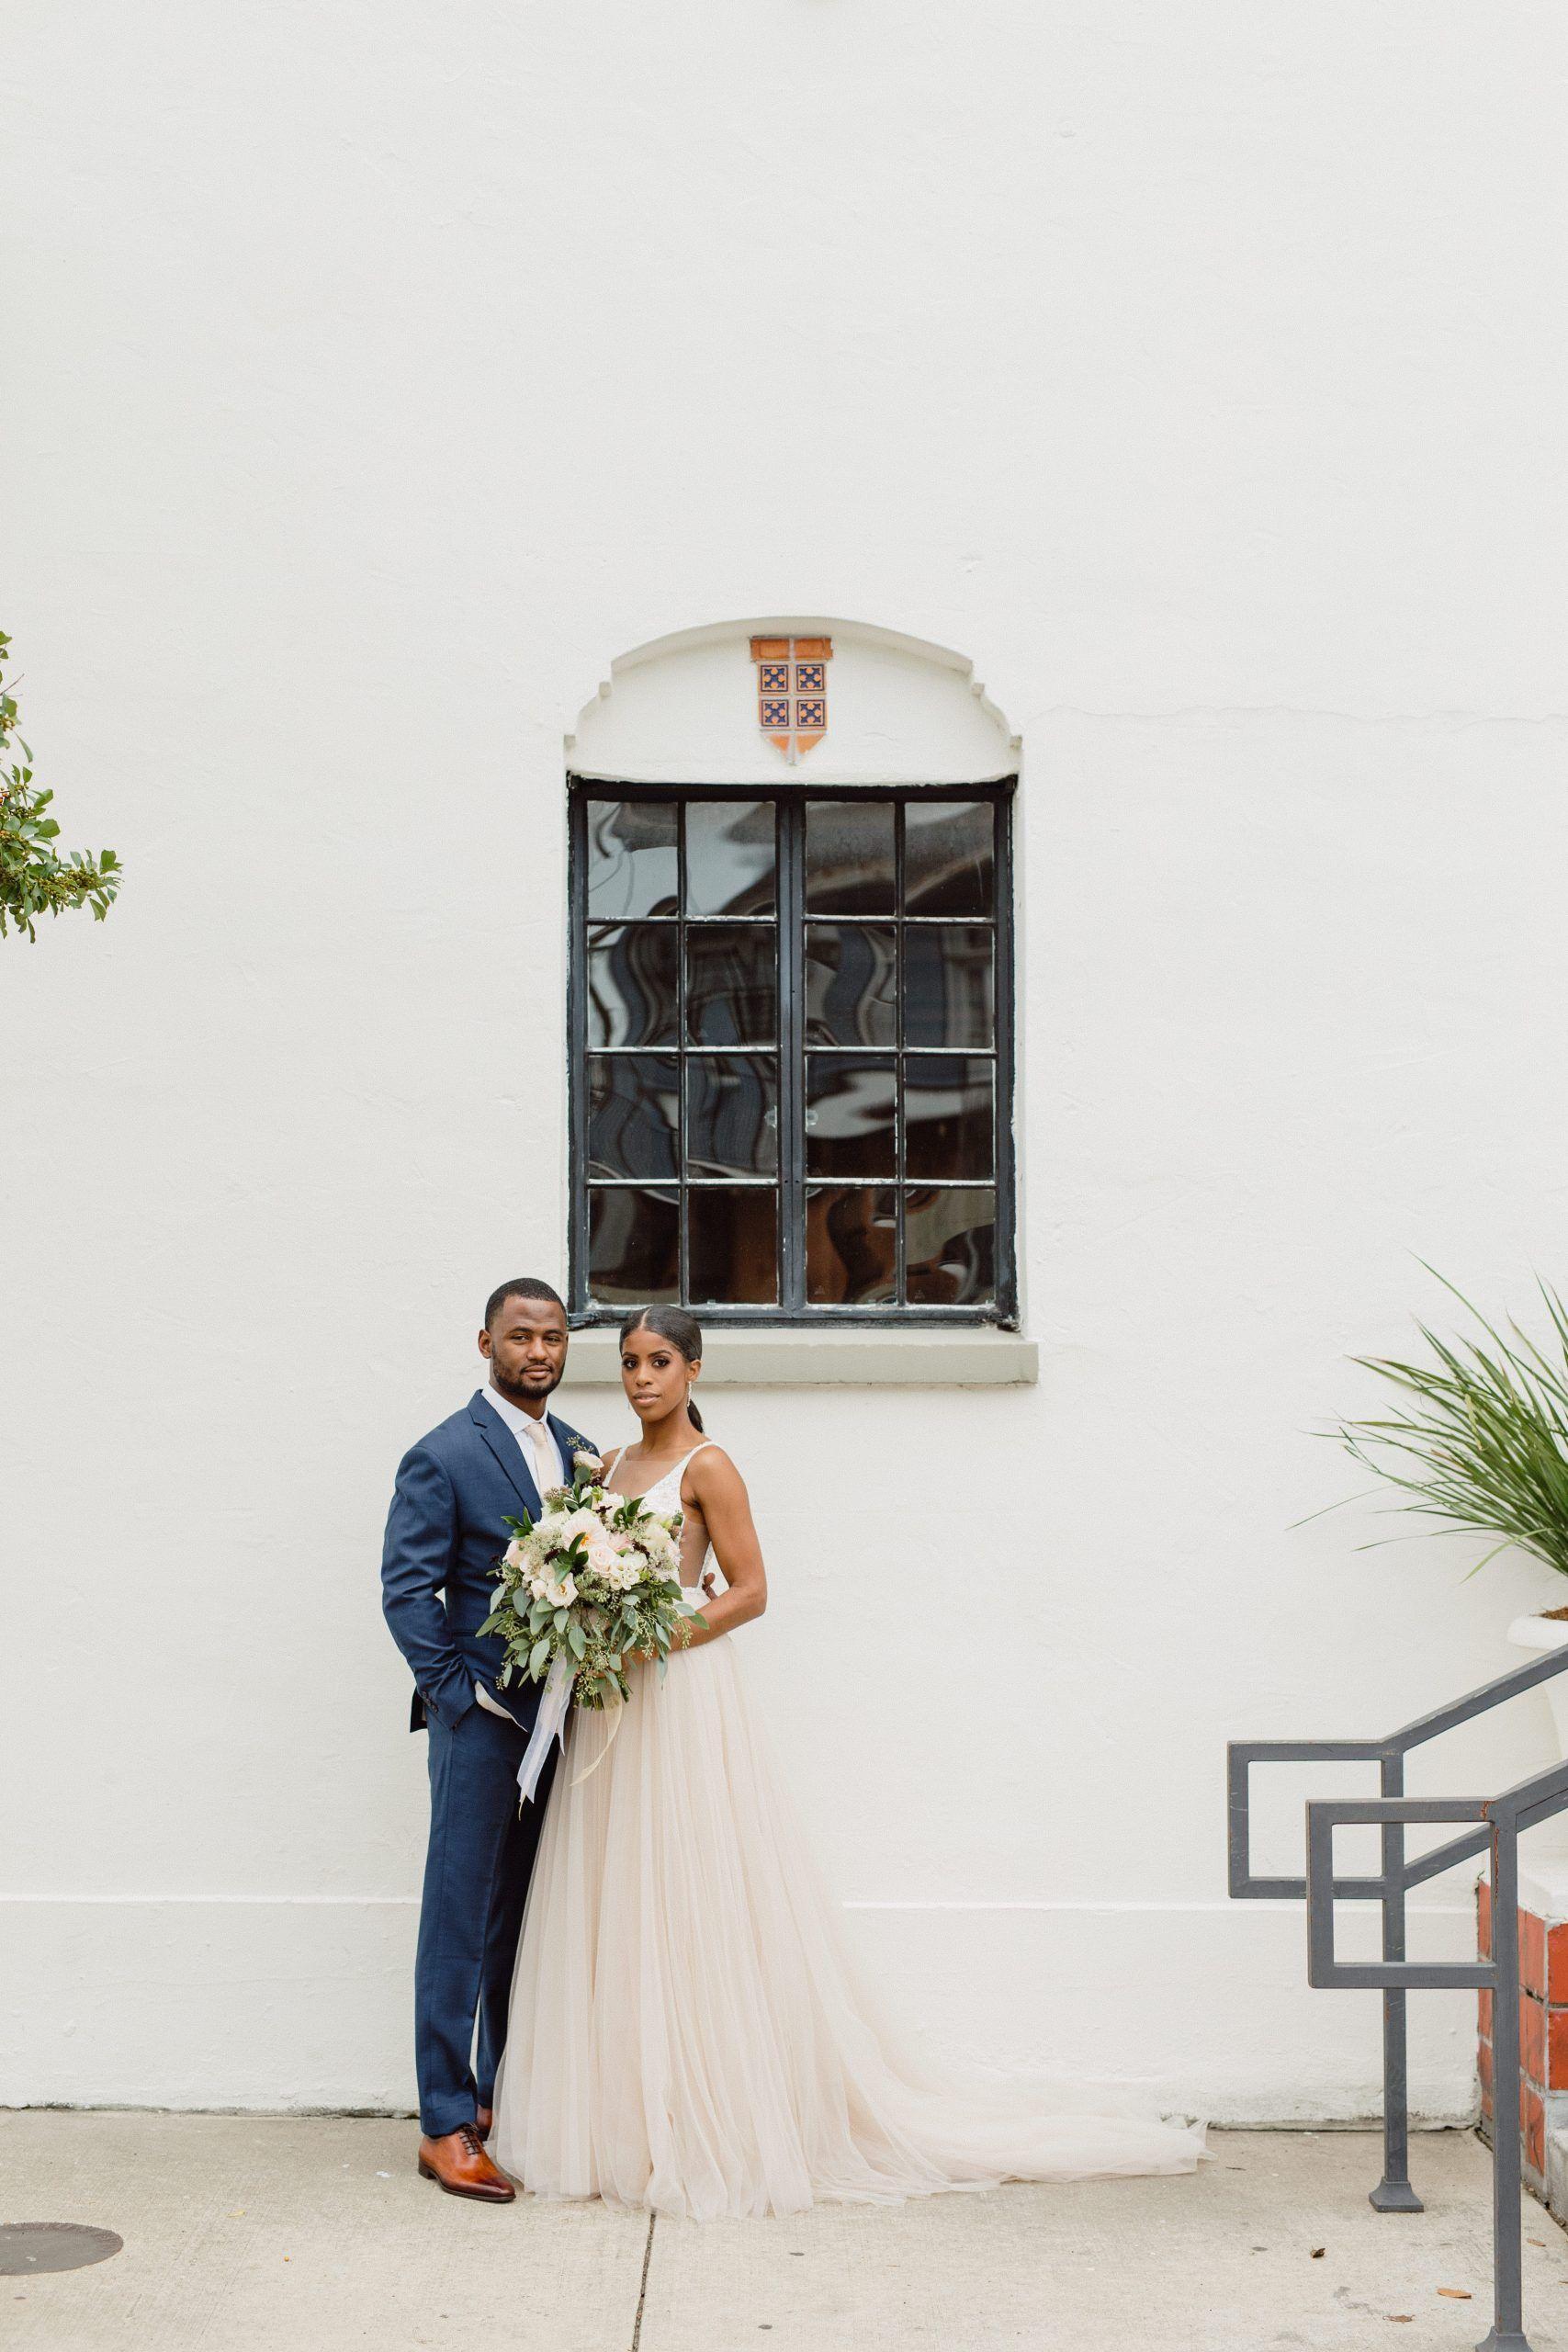 Elegant Fall Micro Wedding At Il Mercato New Orleans La Louisiana Elopement And Wedding Photogr In 2020 Elegant Fall Wedding Wedding Photographers